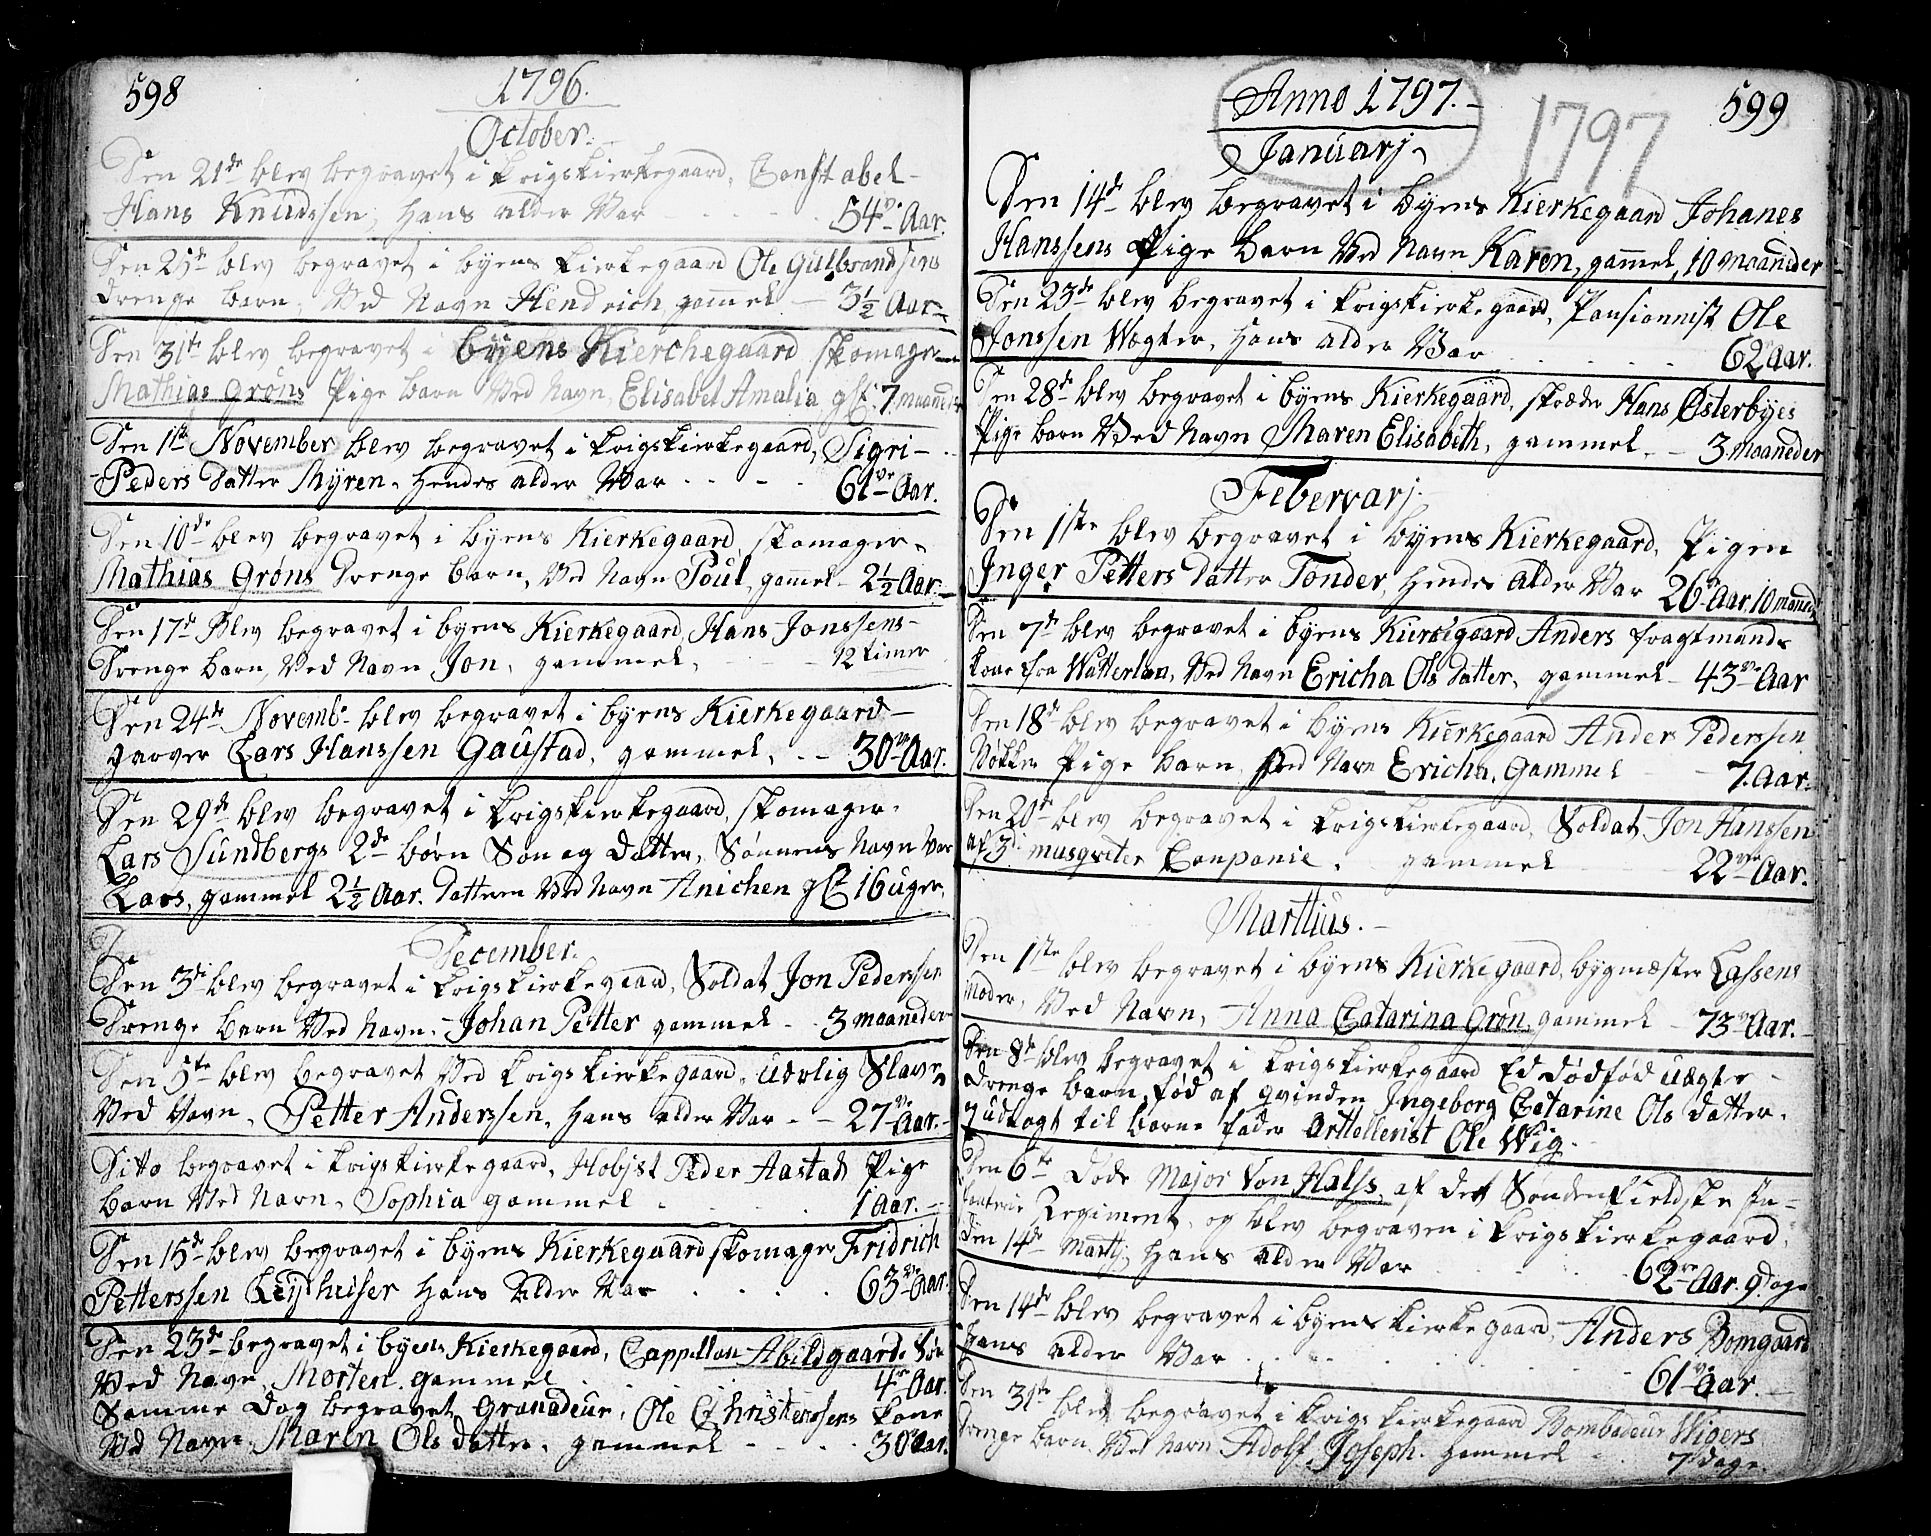 SAO, Fredrikstad prestekontor Kirkebøker, F/Fa/L0002: Parish register (official) no. 2, 1750-1804, p. 598-599